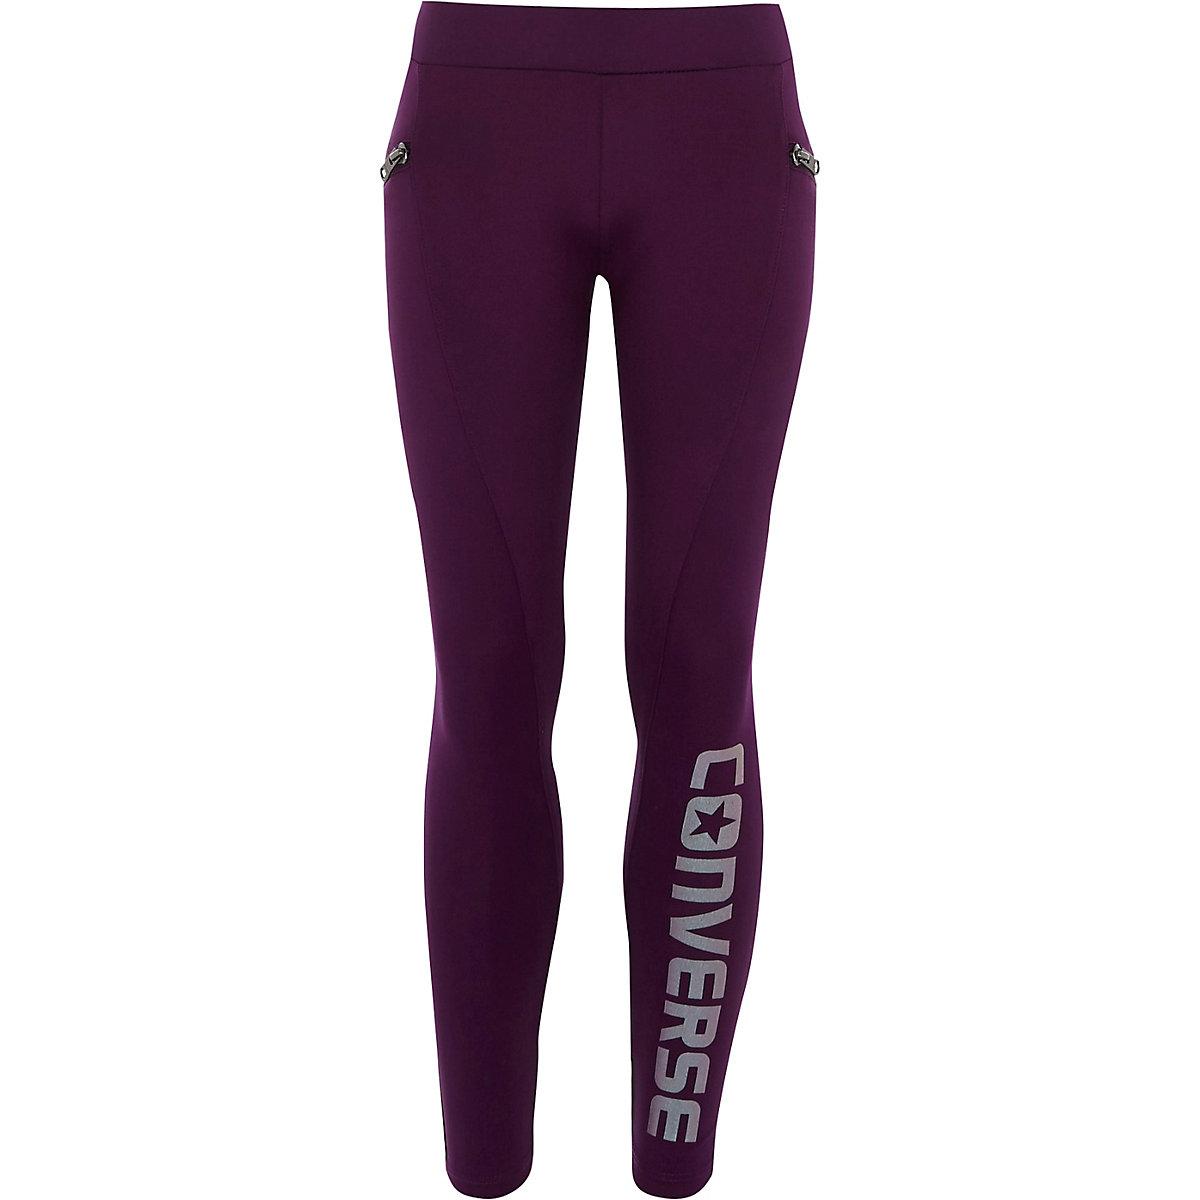 Girls Converse purple zip side leggings